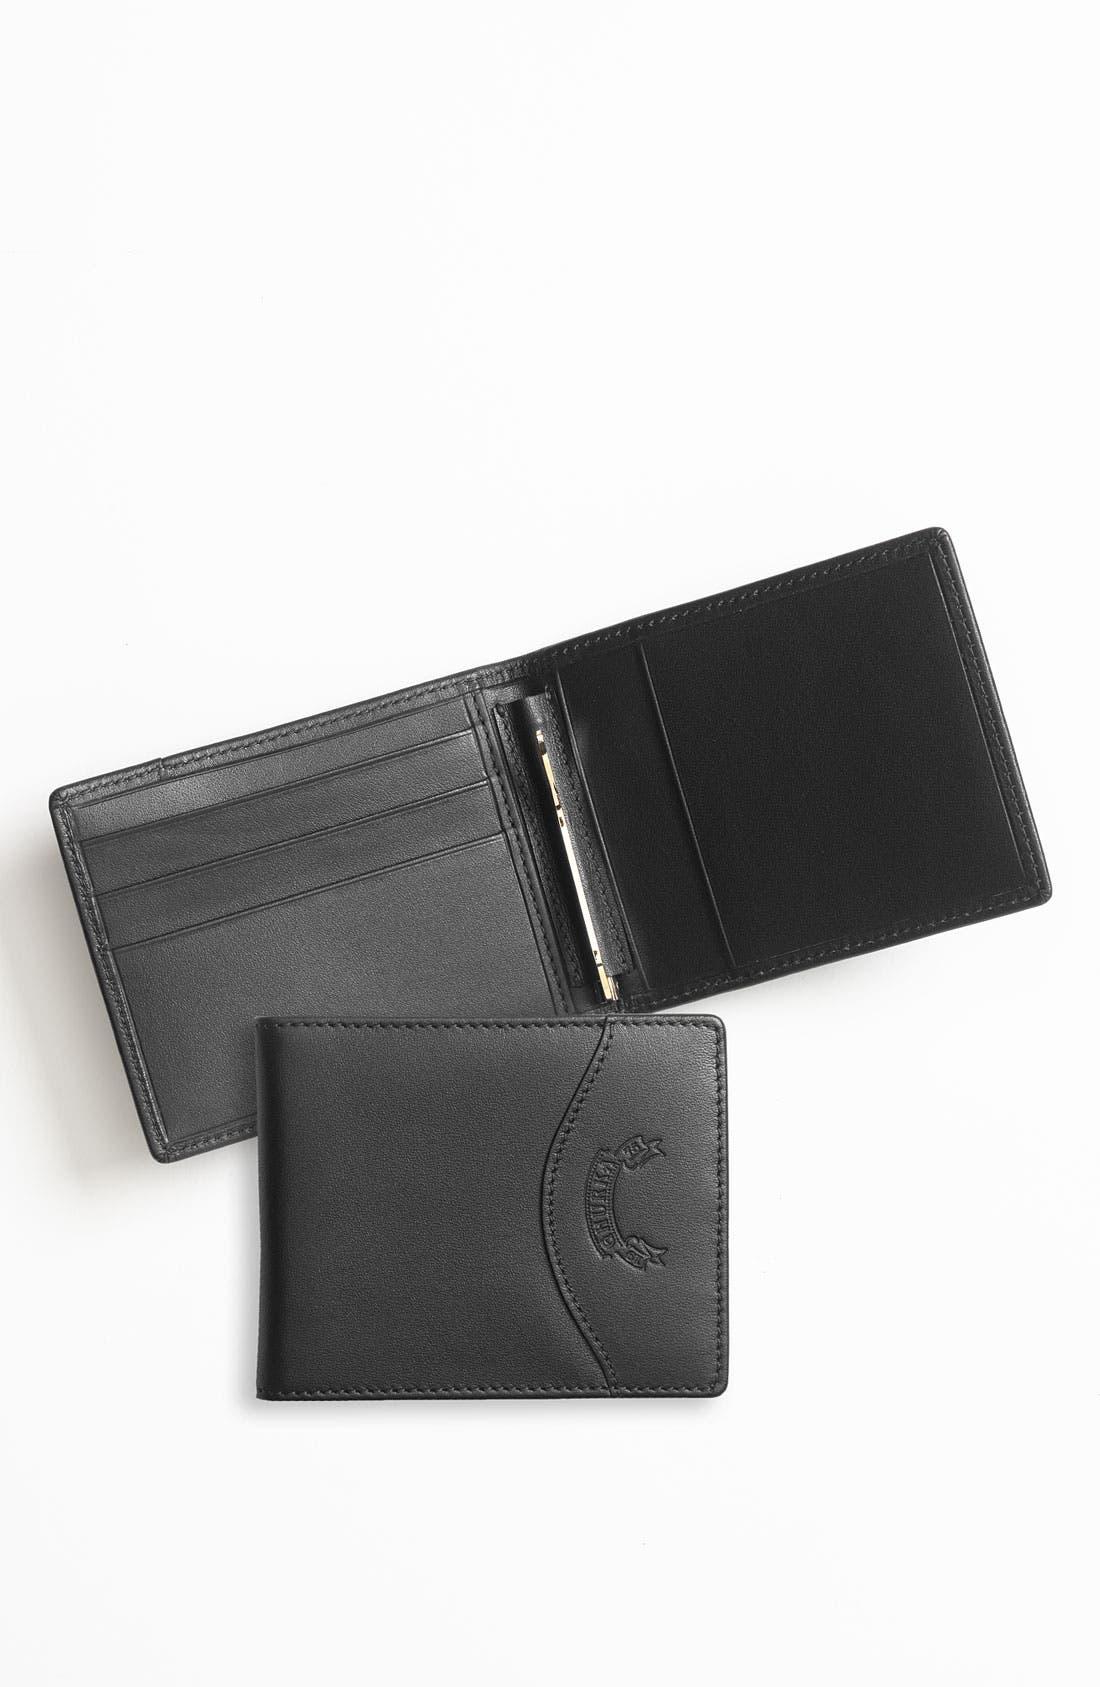 Leather Money Clip Wallet, Main, color, 001